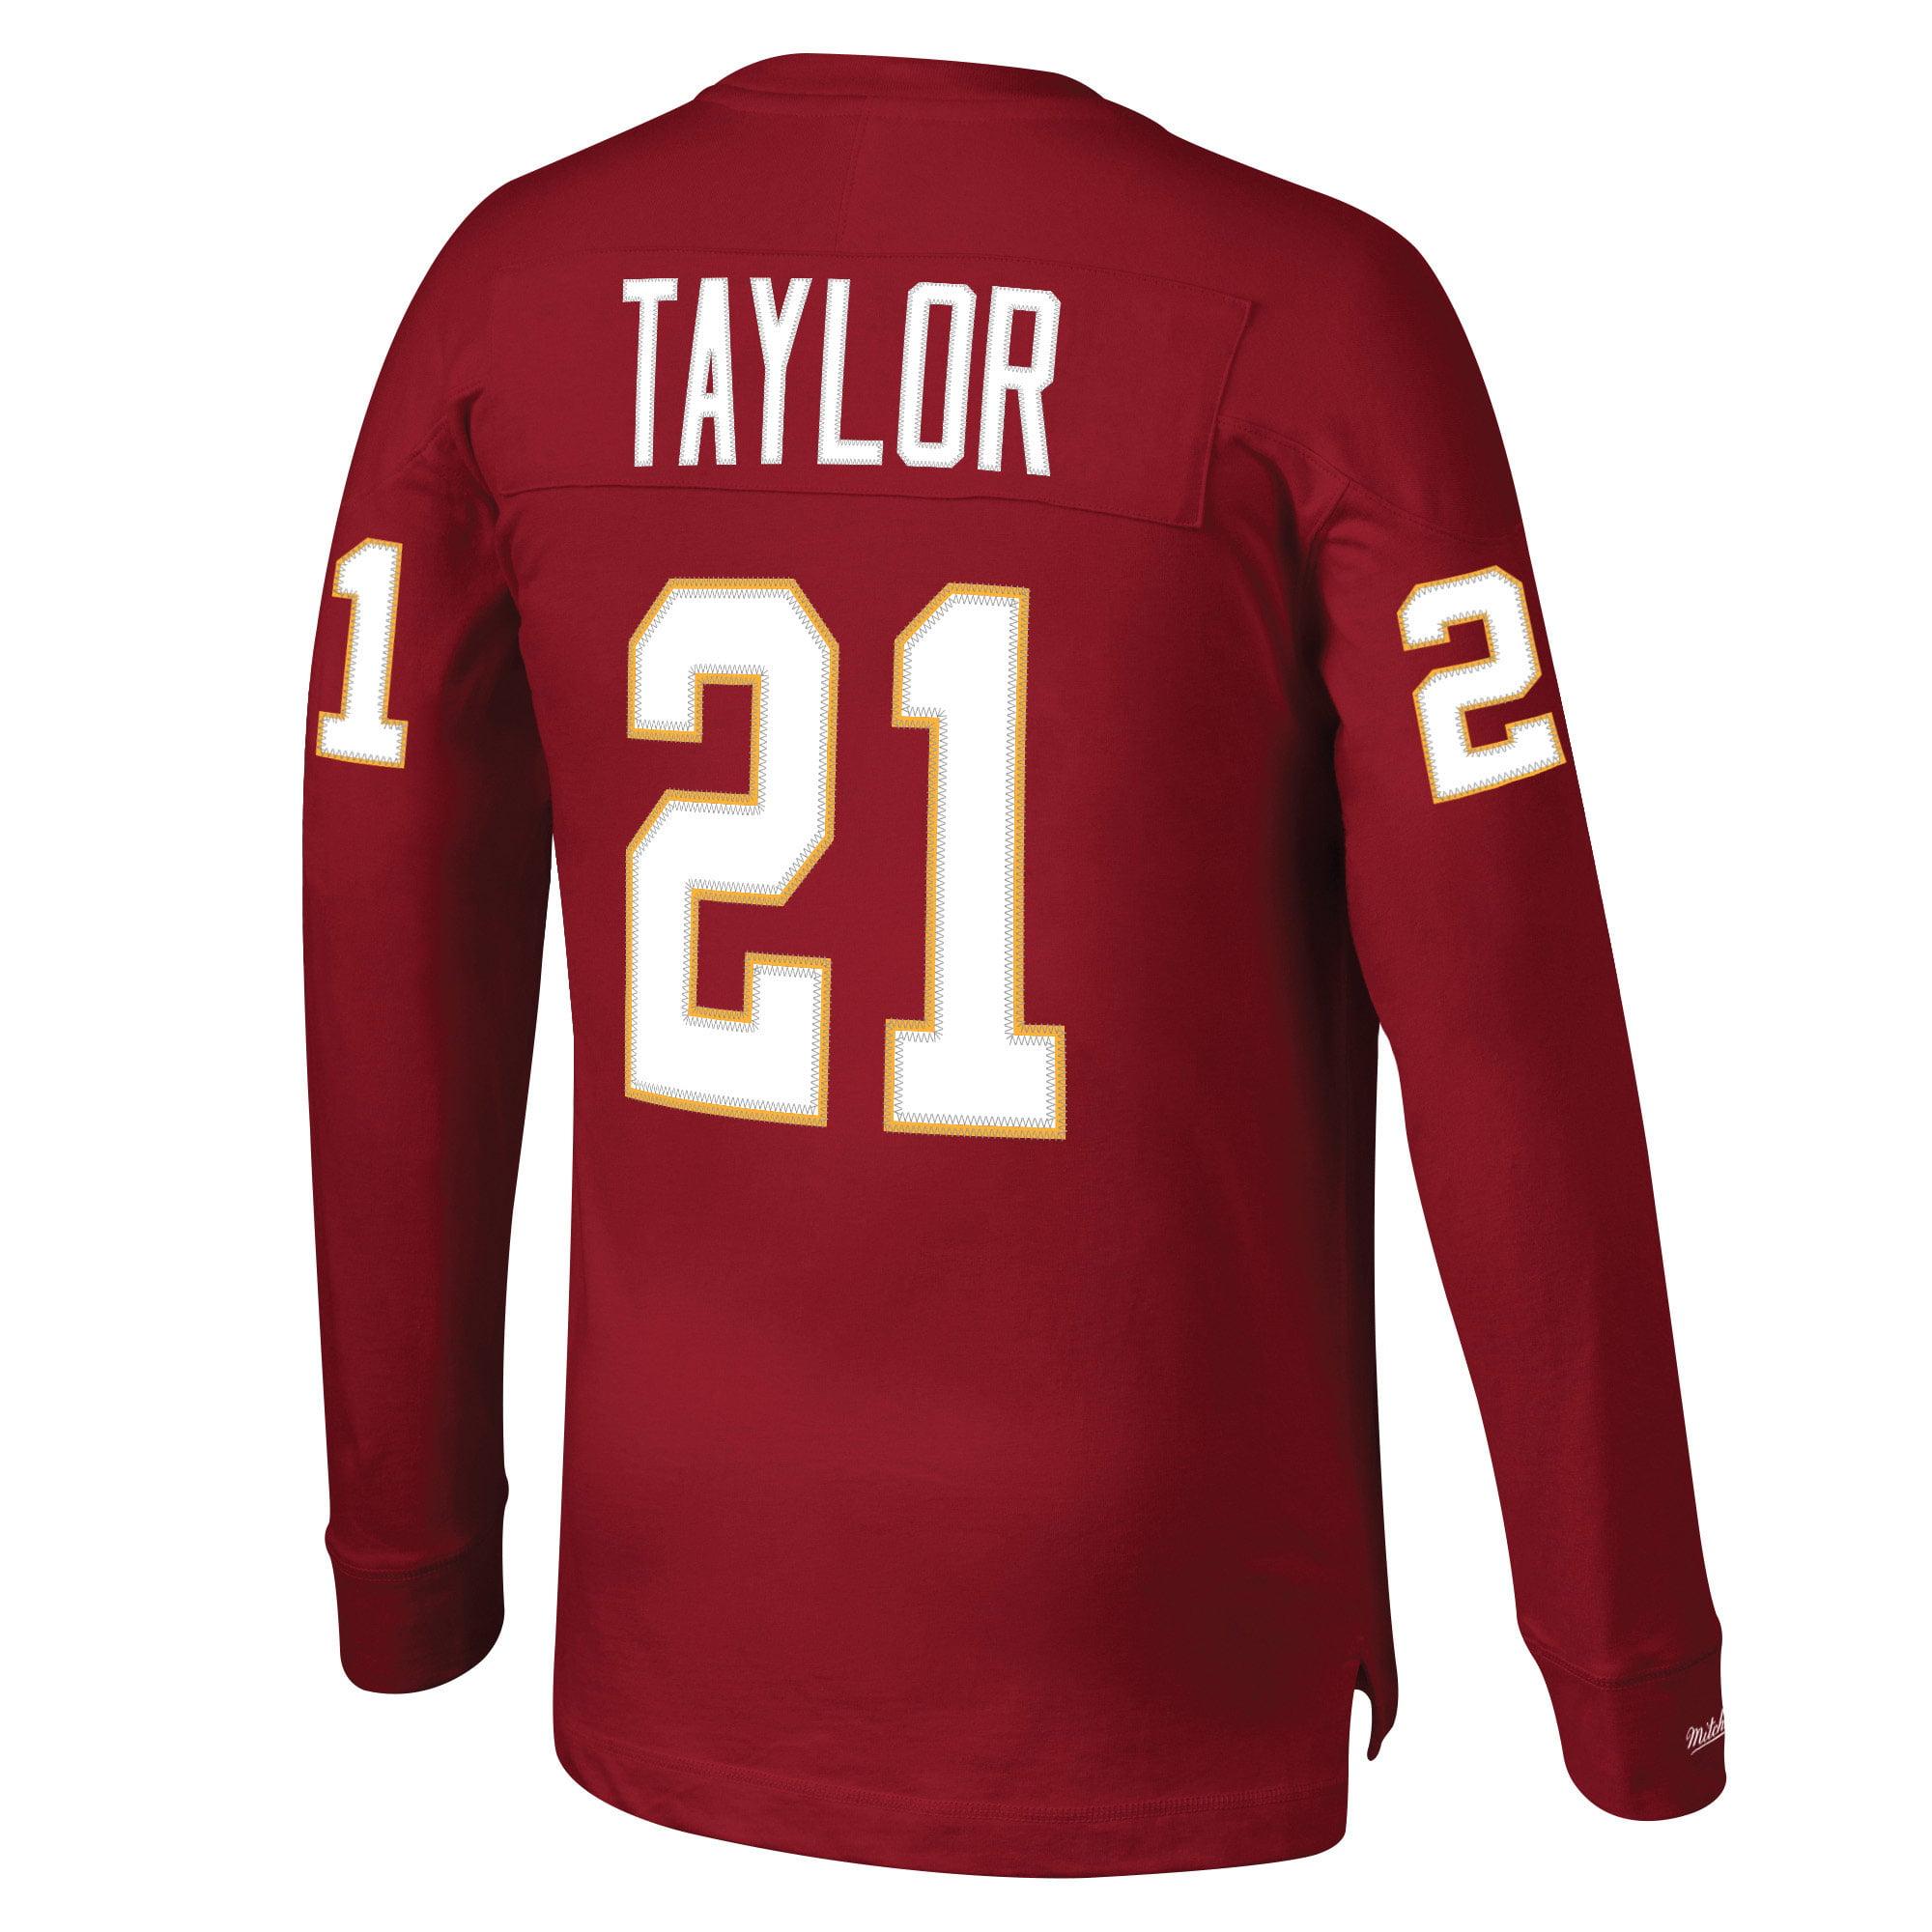 new styles 8c423 e1923 Sean Taylor Washington Redskins Mitchell & Ness Throwback Name & Number  Long Sleeve T-Shirt - Burgundy